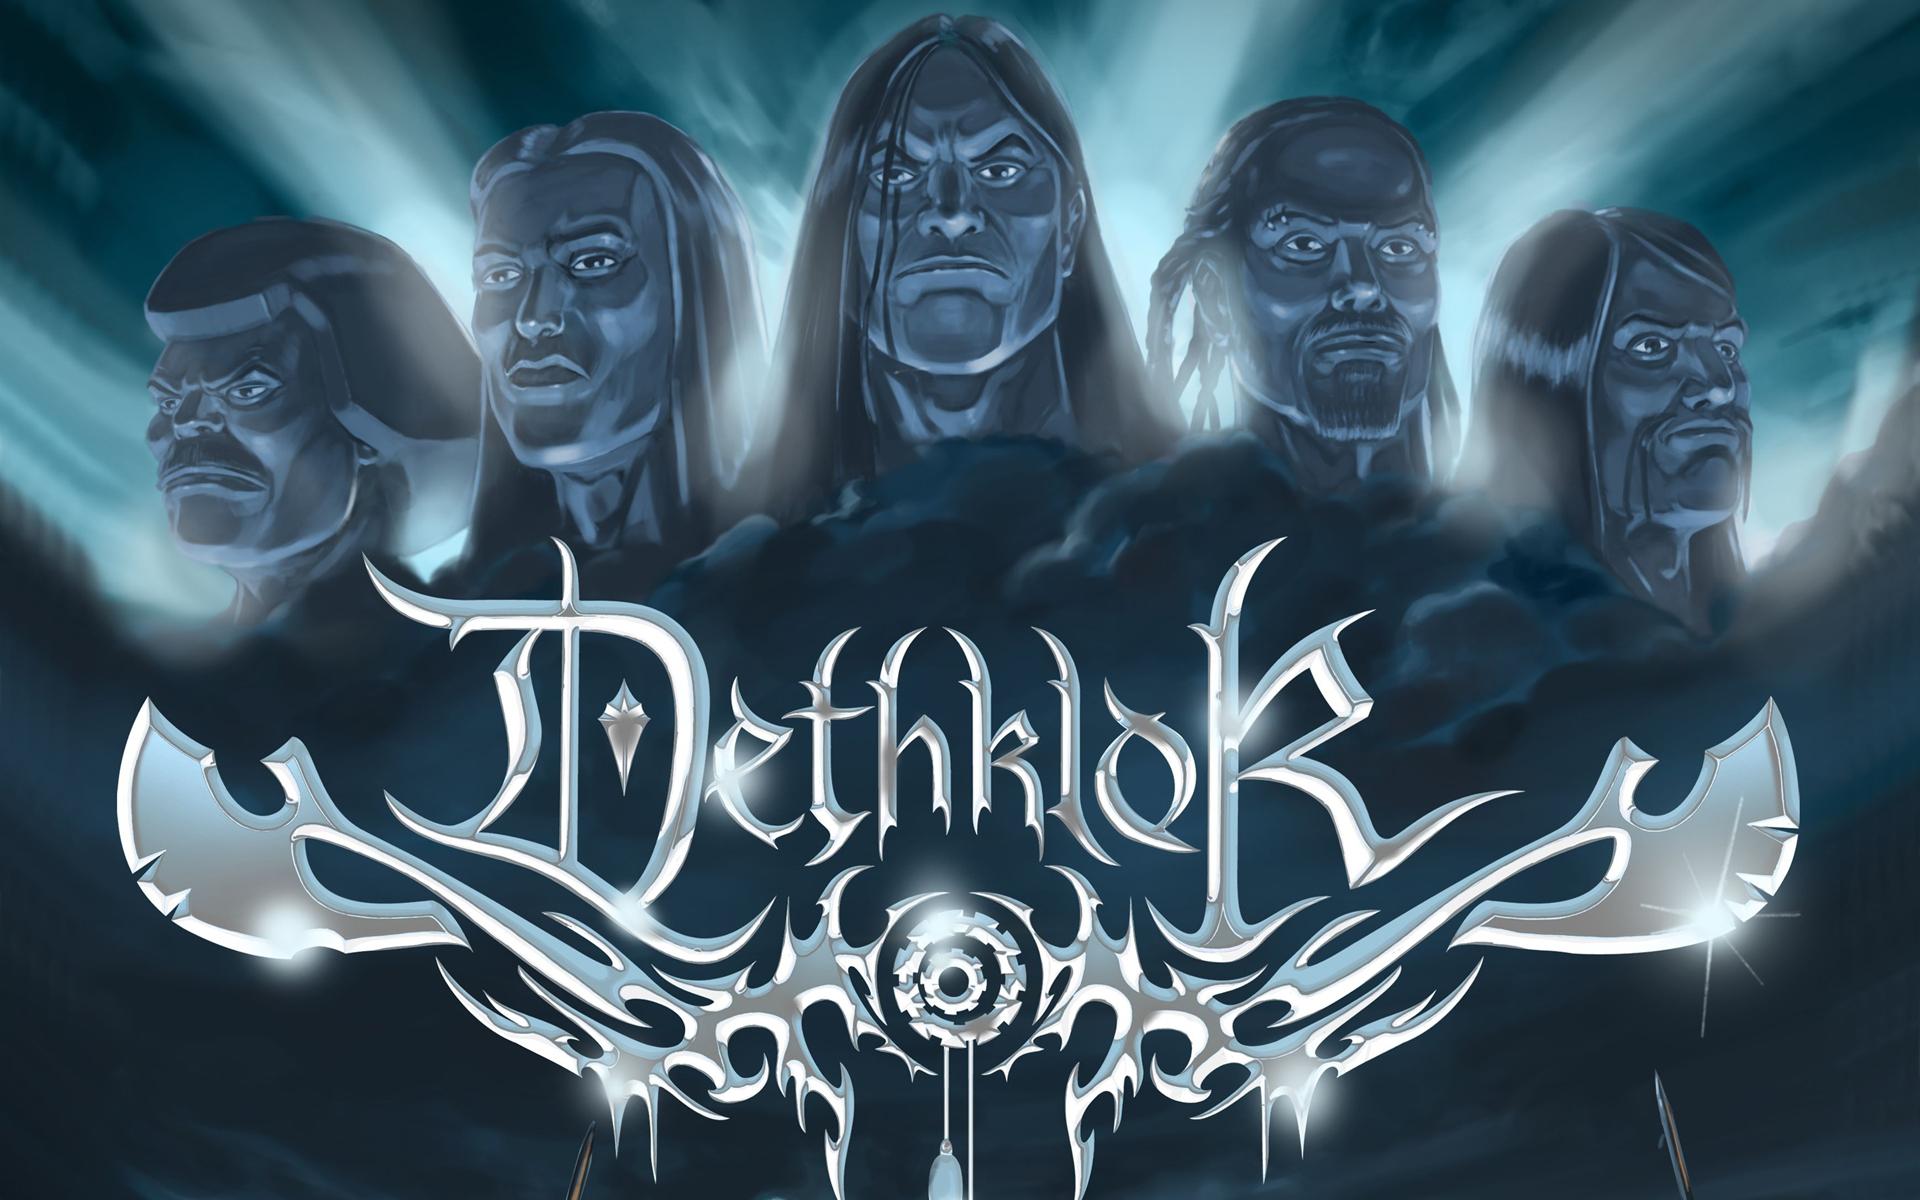 dethklok heavy metal music cartoons hard rock band groups